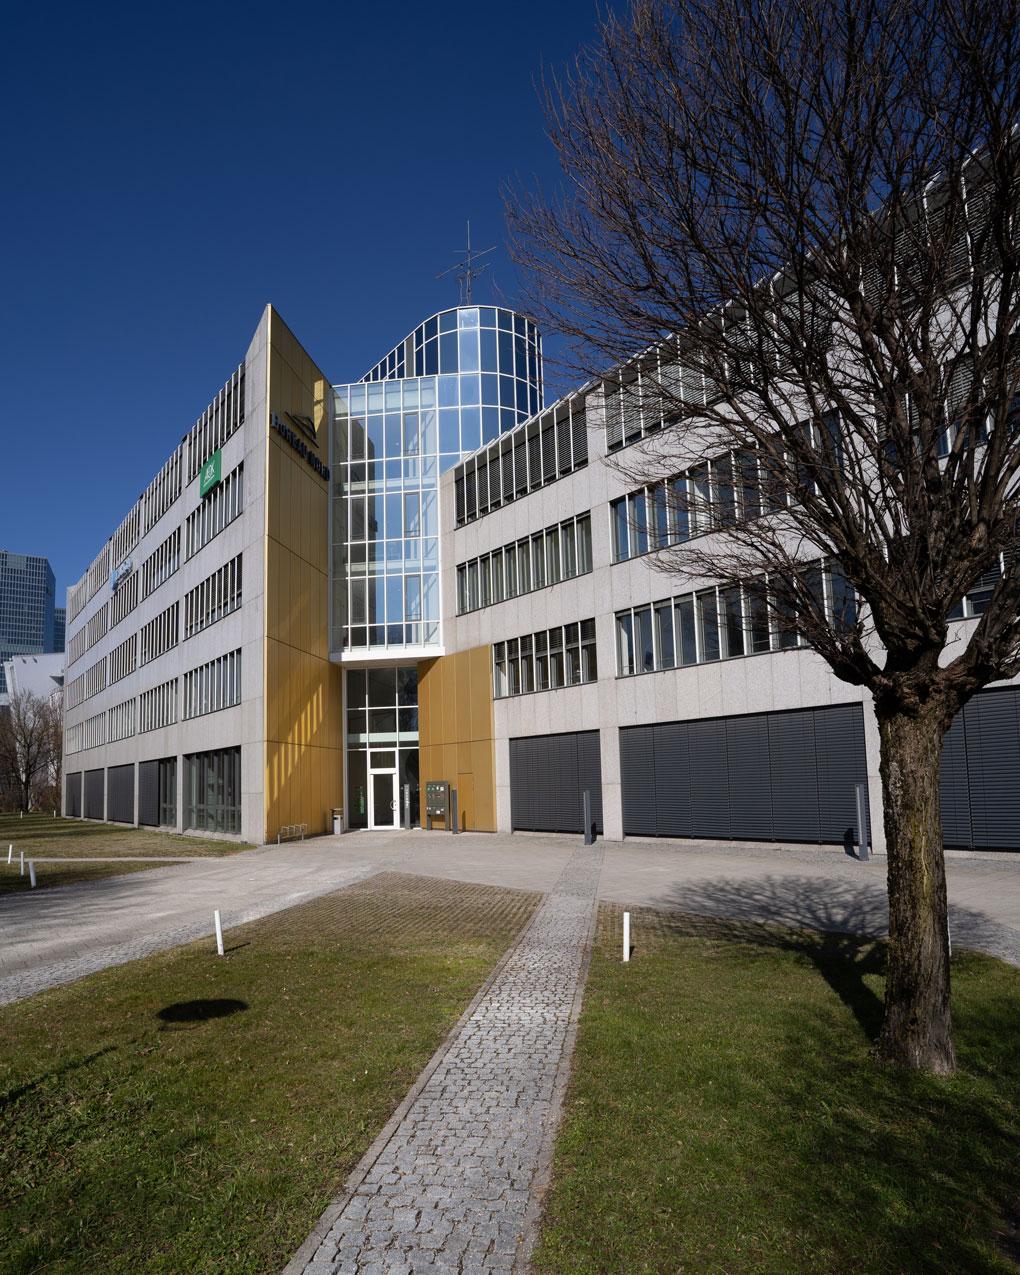 AWETHA_Bureau-Nord_Muenchen_Projektsteuerung-00868